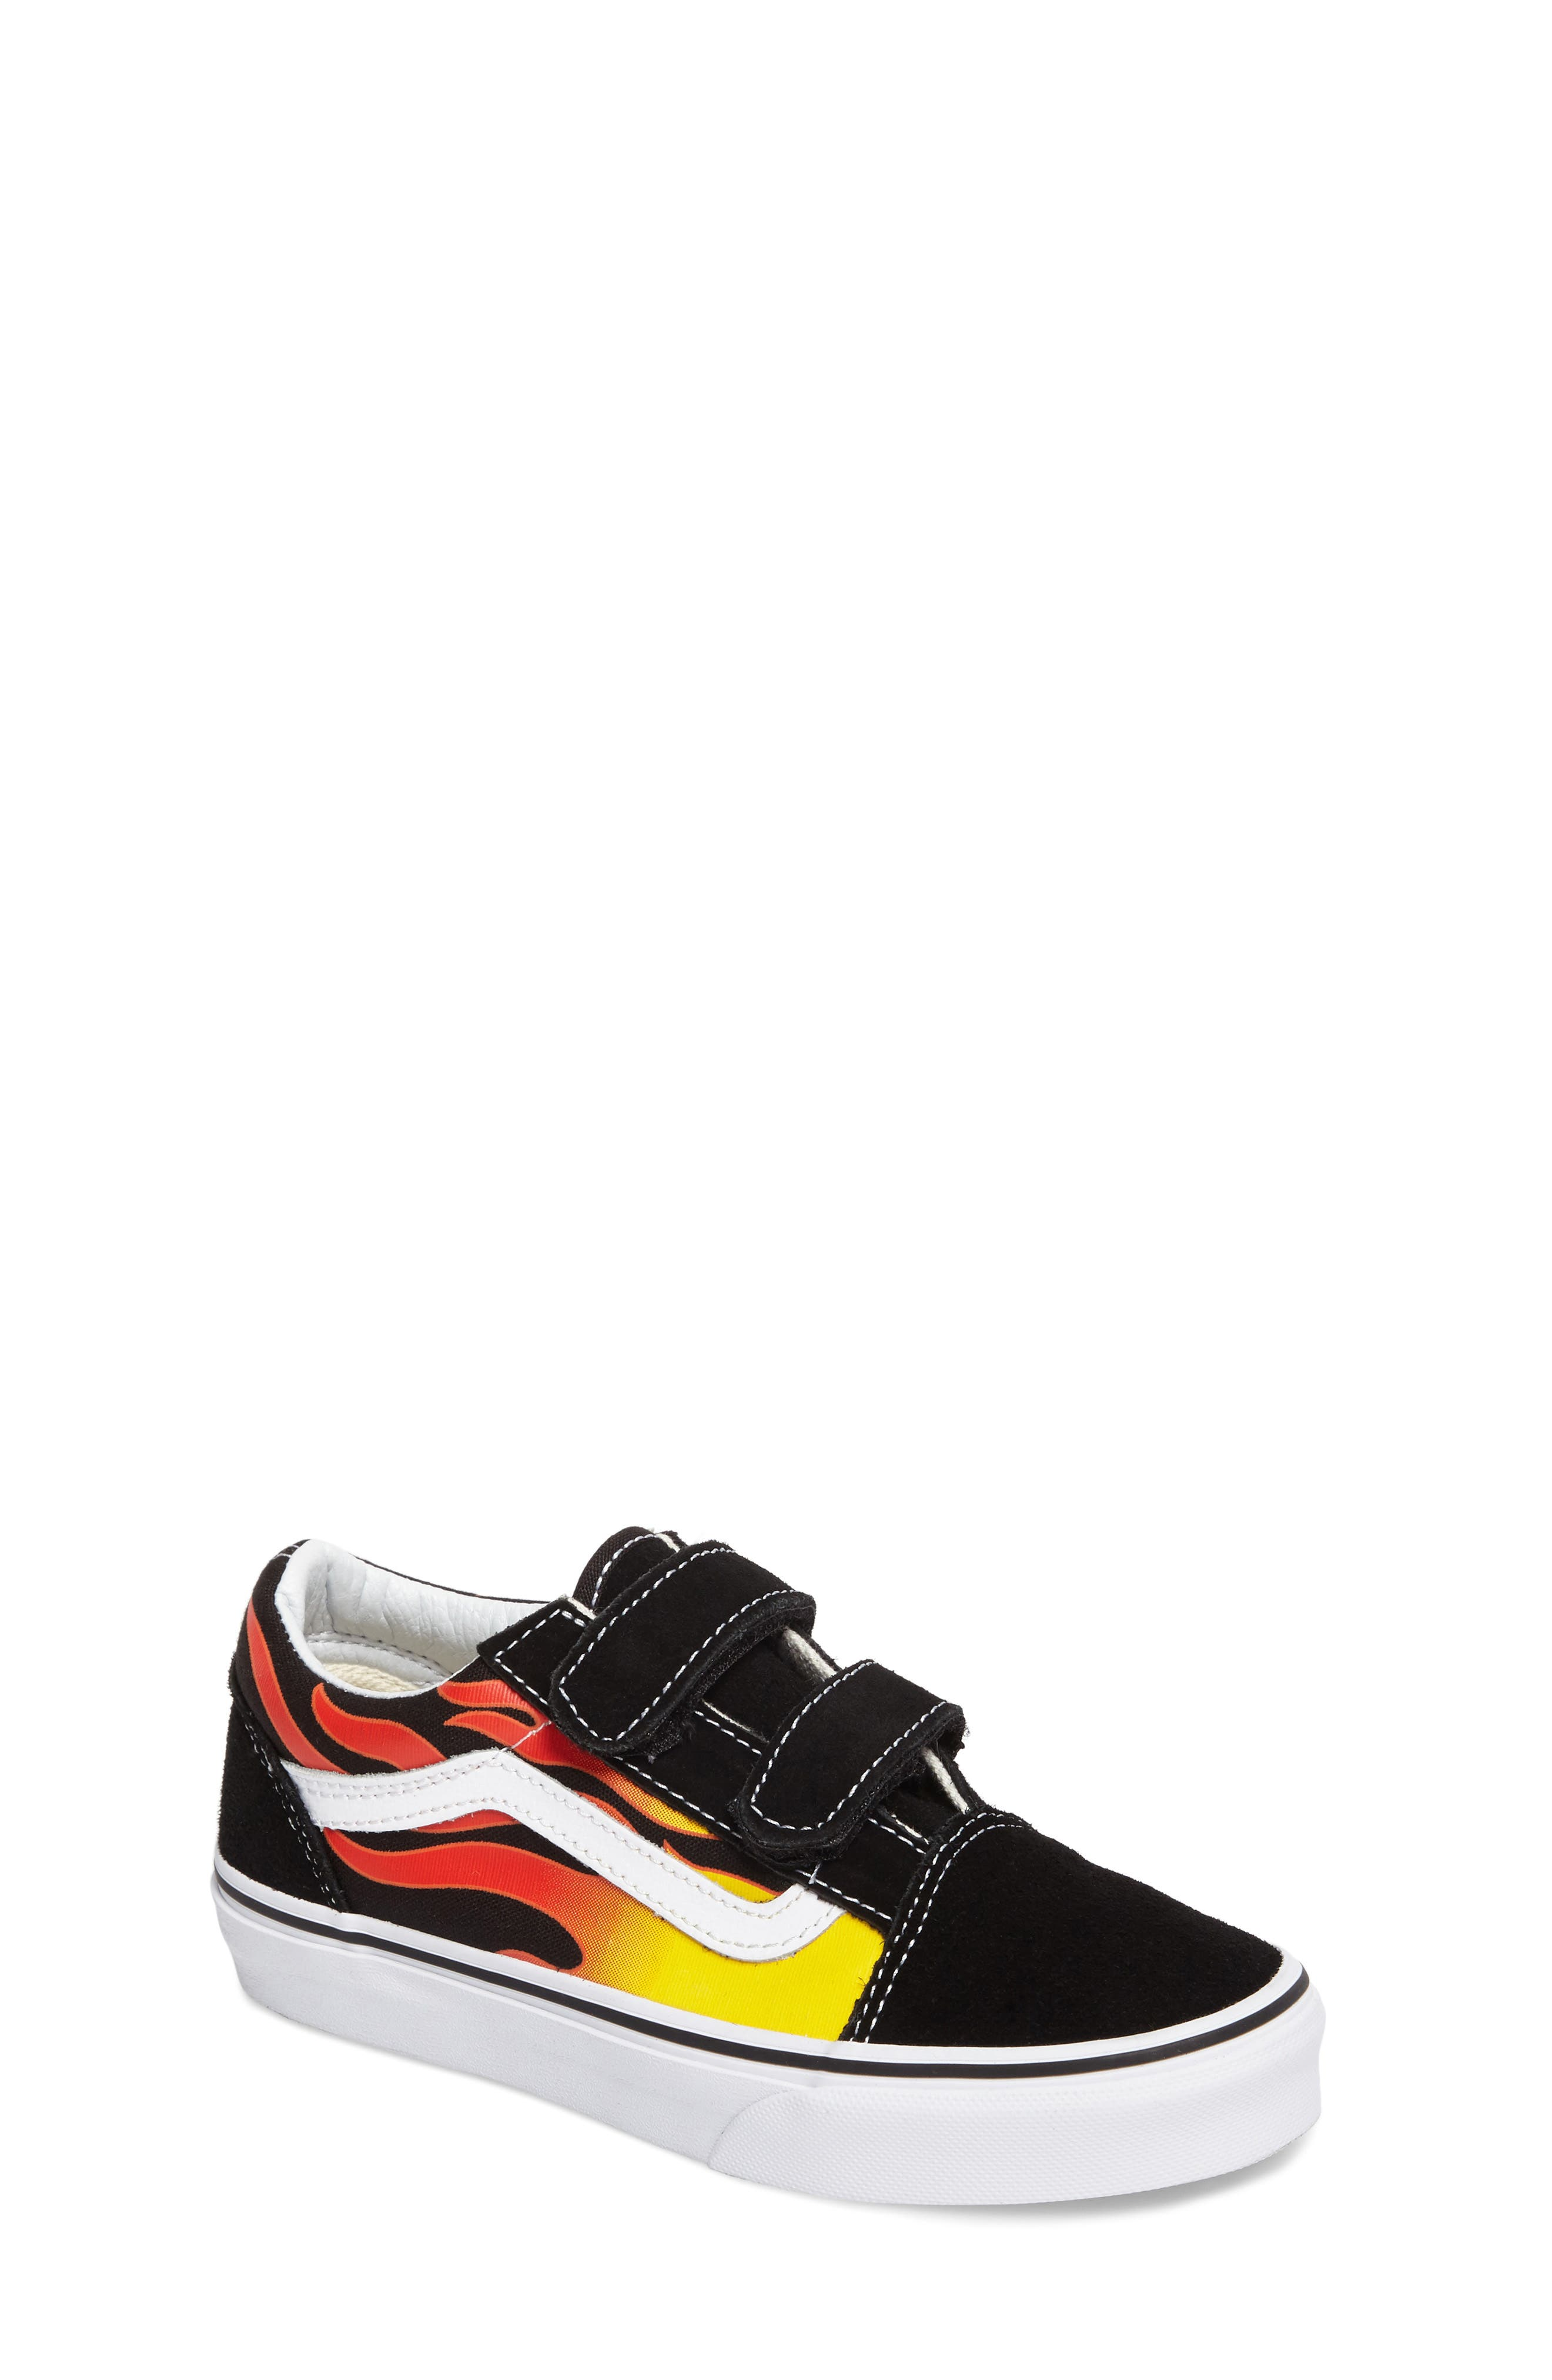 Alternate Image 1 Selected - Vans Old Skool V Sneaker (Baby, Walker, Toddler, Little Kid & Big Kid)